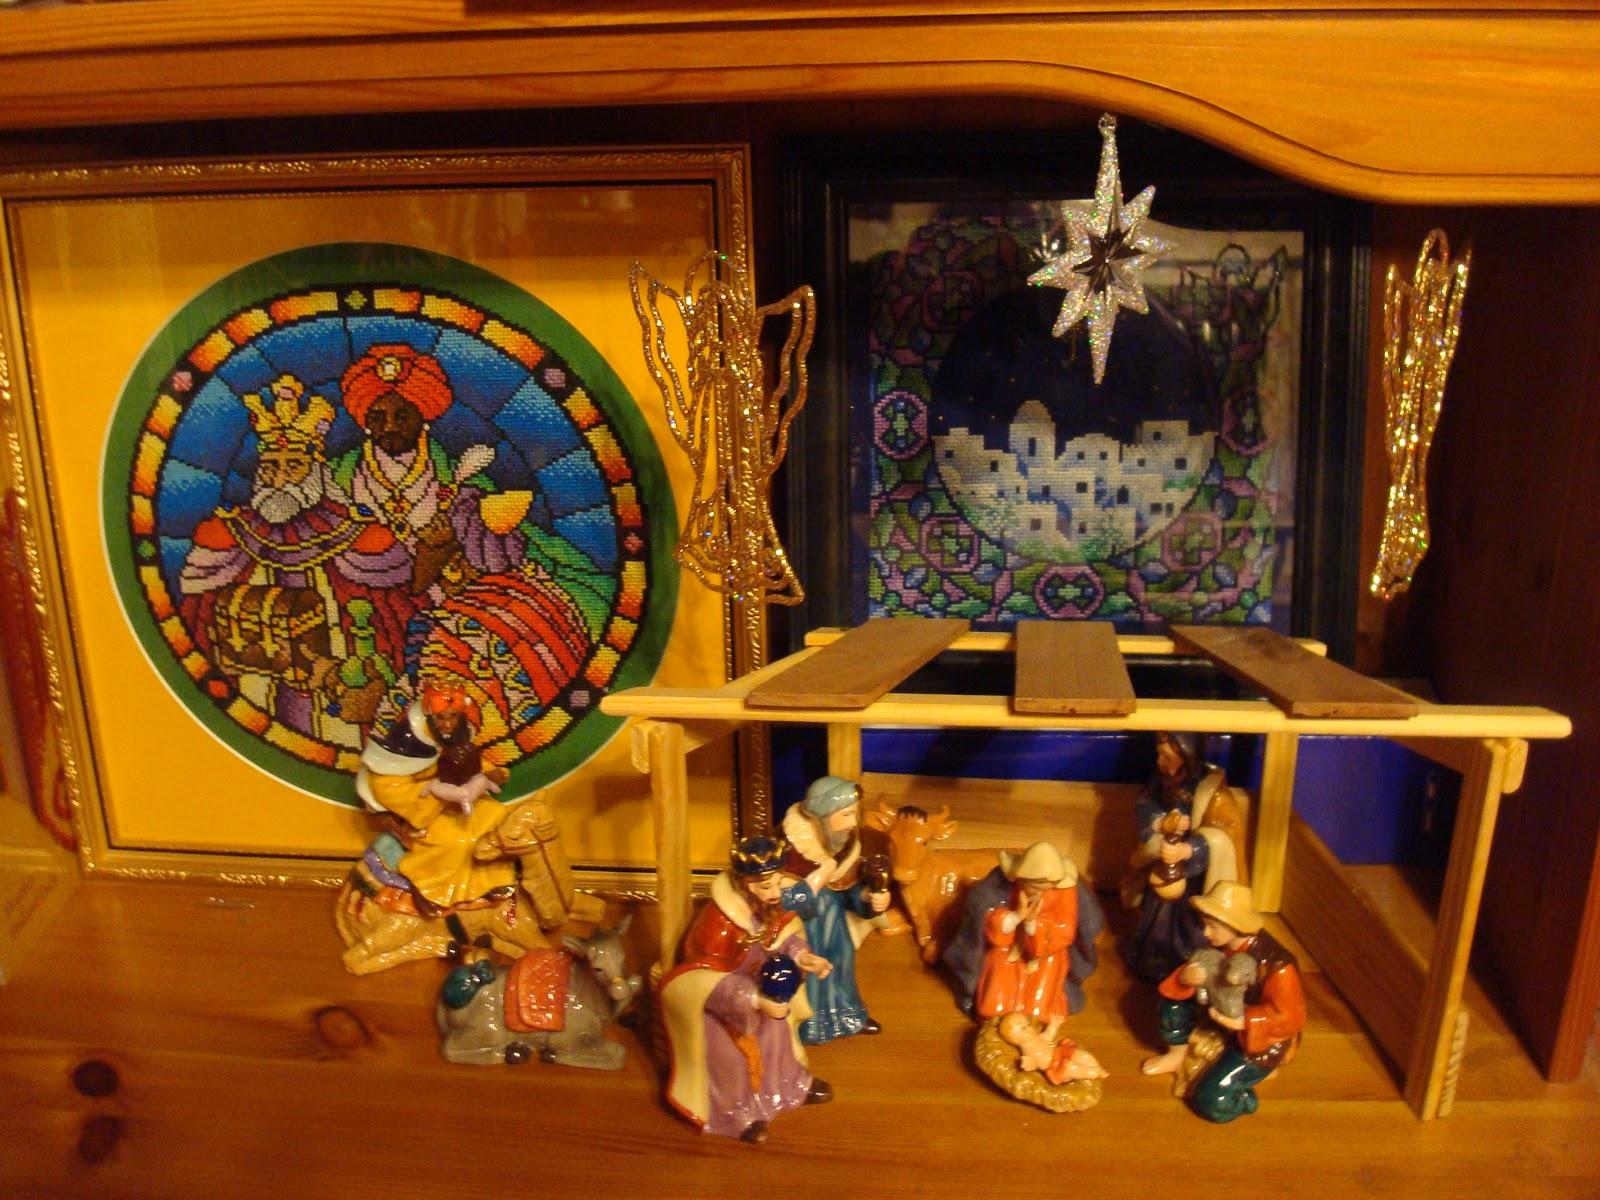 Serendipitous Stitching: 2011 Online Advent Calendar